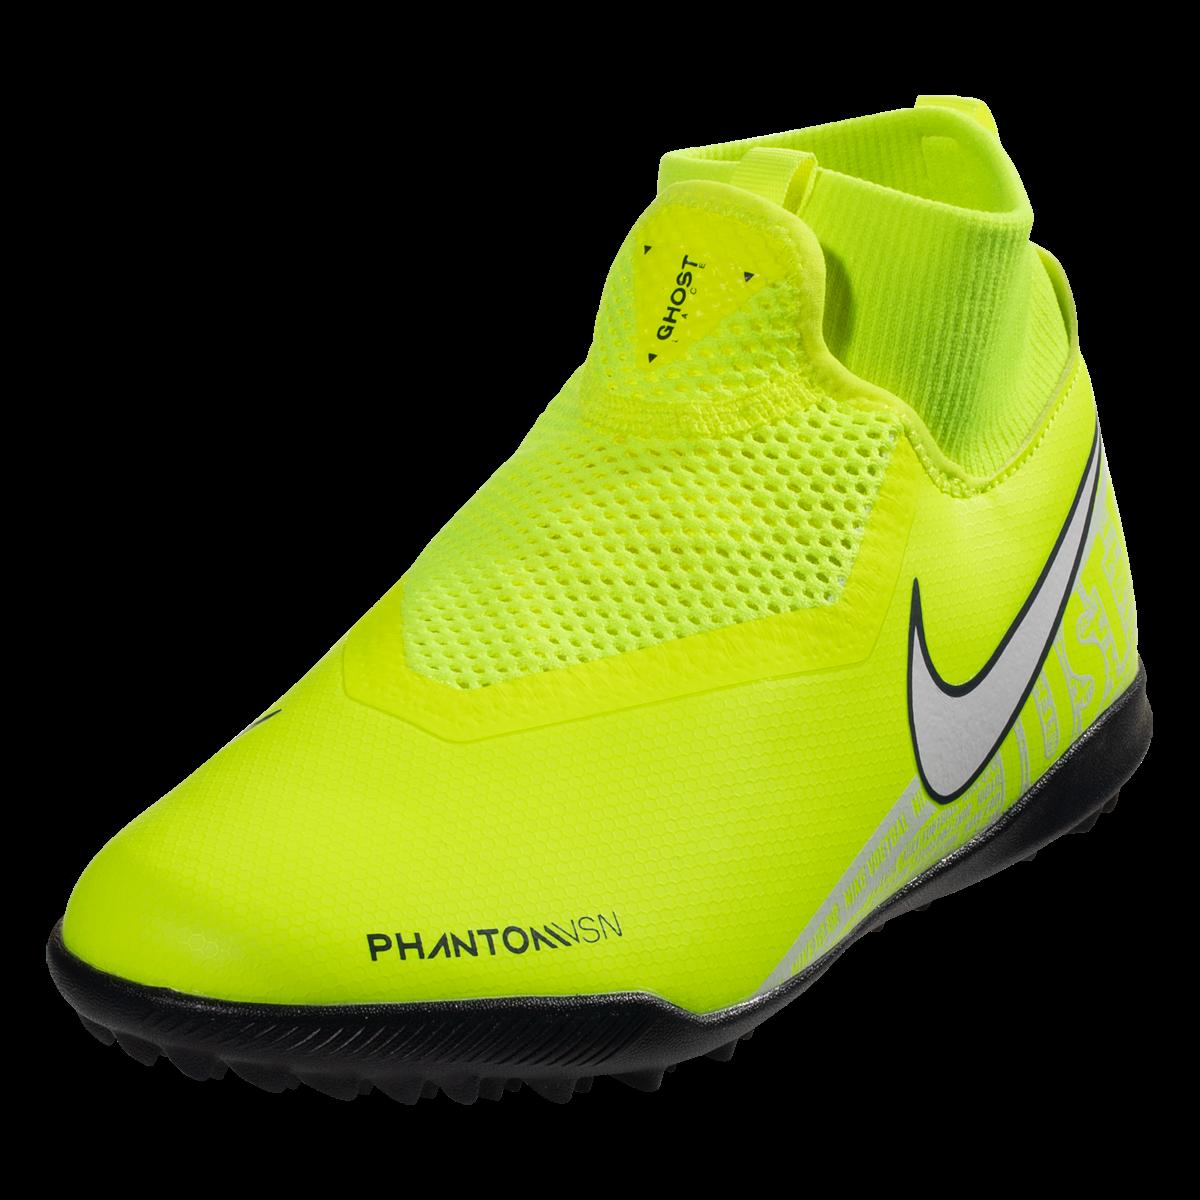 Nike Junior Phantom Vision Academy Df Tf Artificial Turf Soccer Shoe Volt White Obsidian 4 5 Soccer Shoe Soccer Shoes Soccer